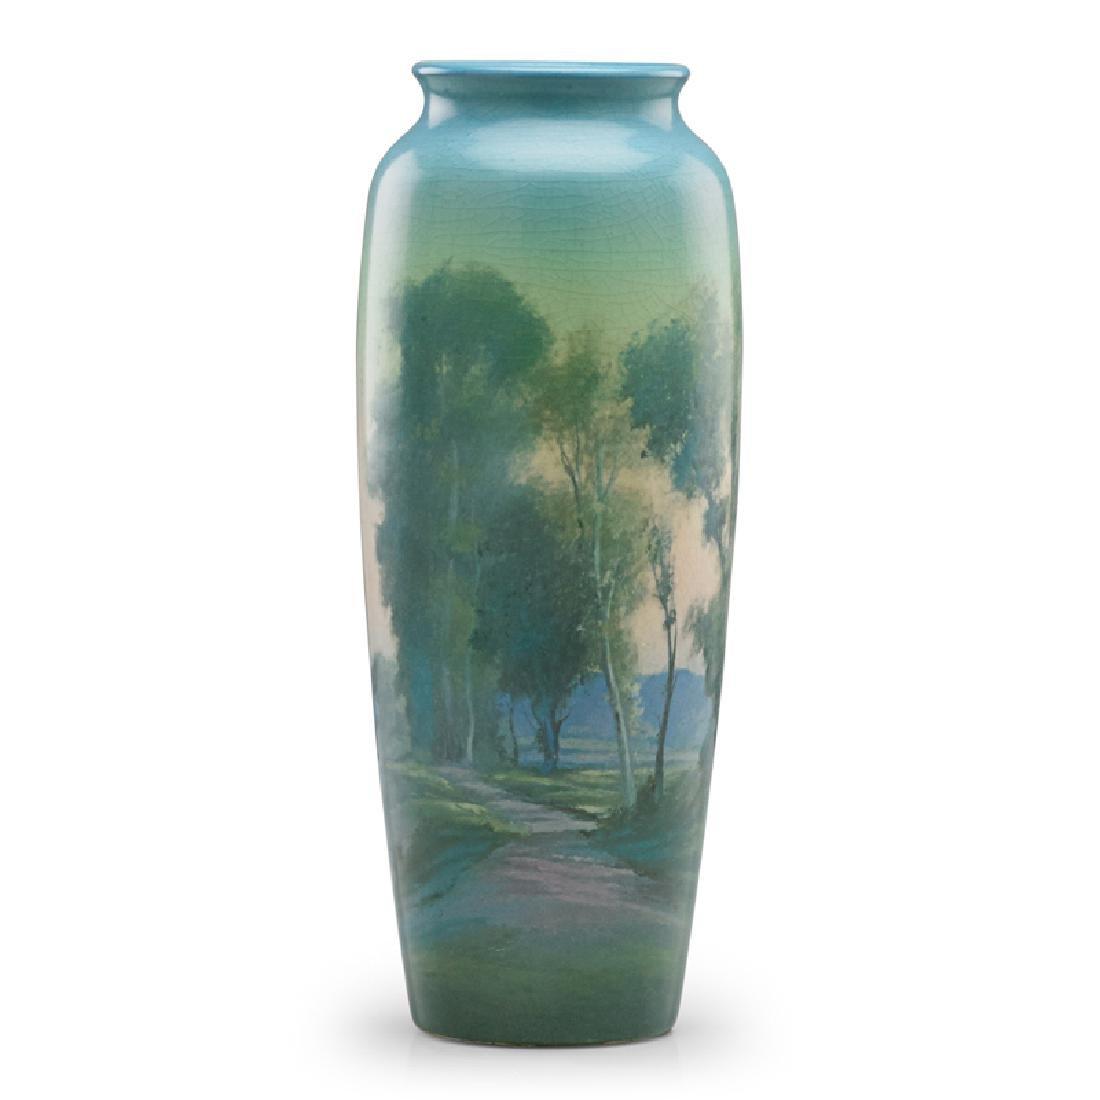 F. ROTHENBUSCH; ROOKWOOD Scenic Vellum vase